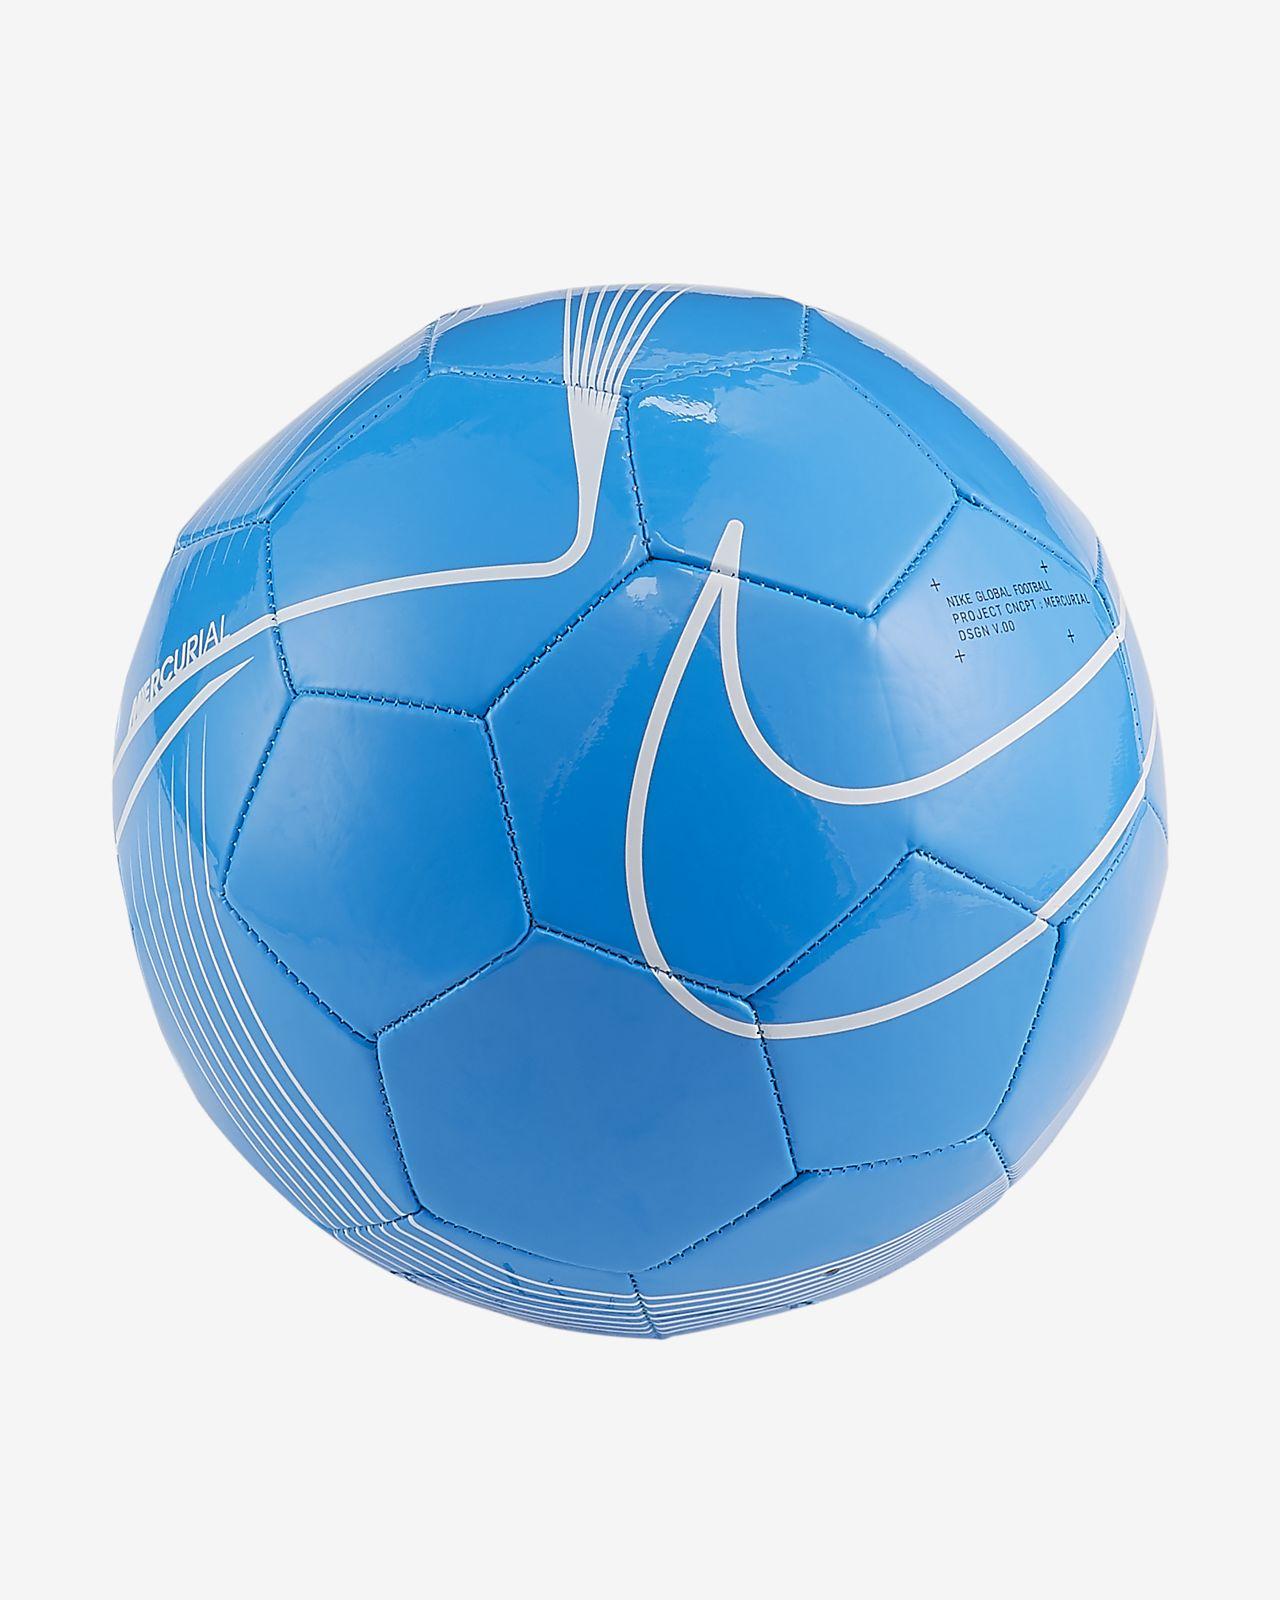 b086766256e57 Nike Mercurial Fade Unisex Soccer Ball. Nike.com